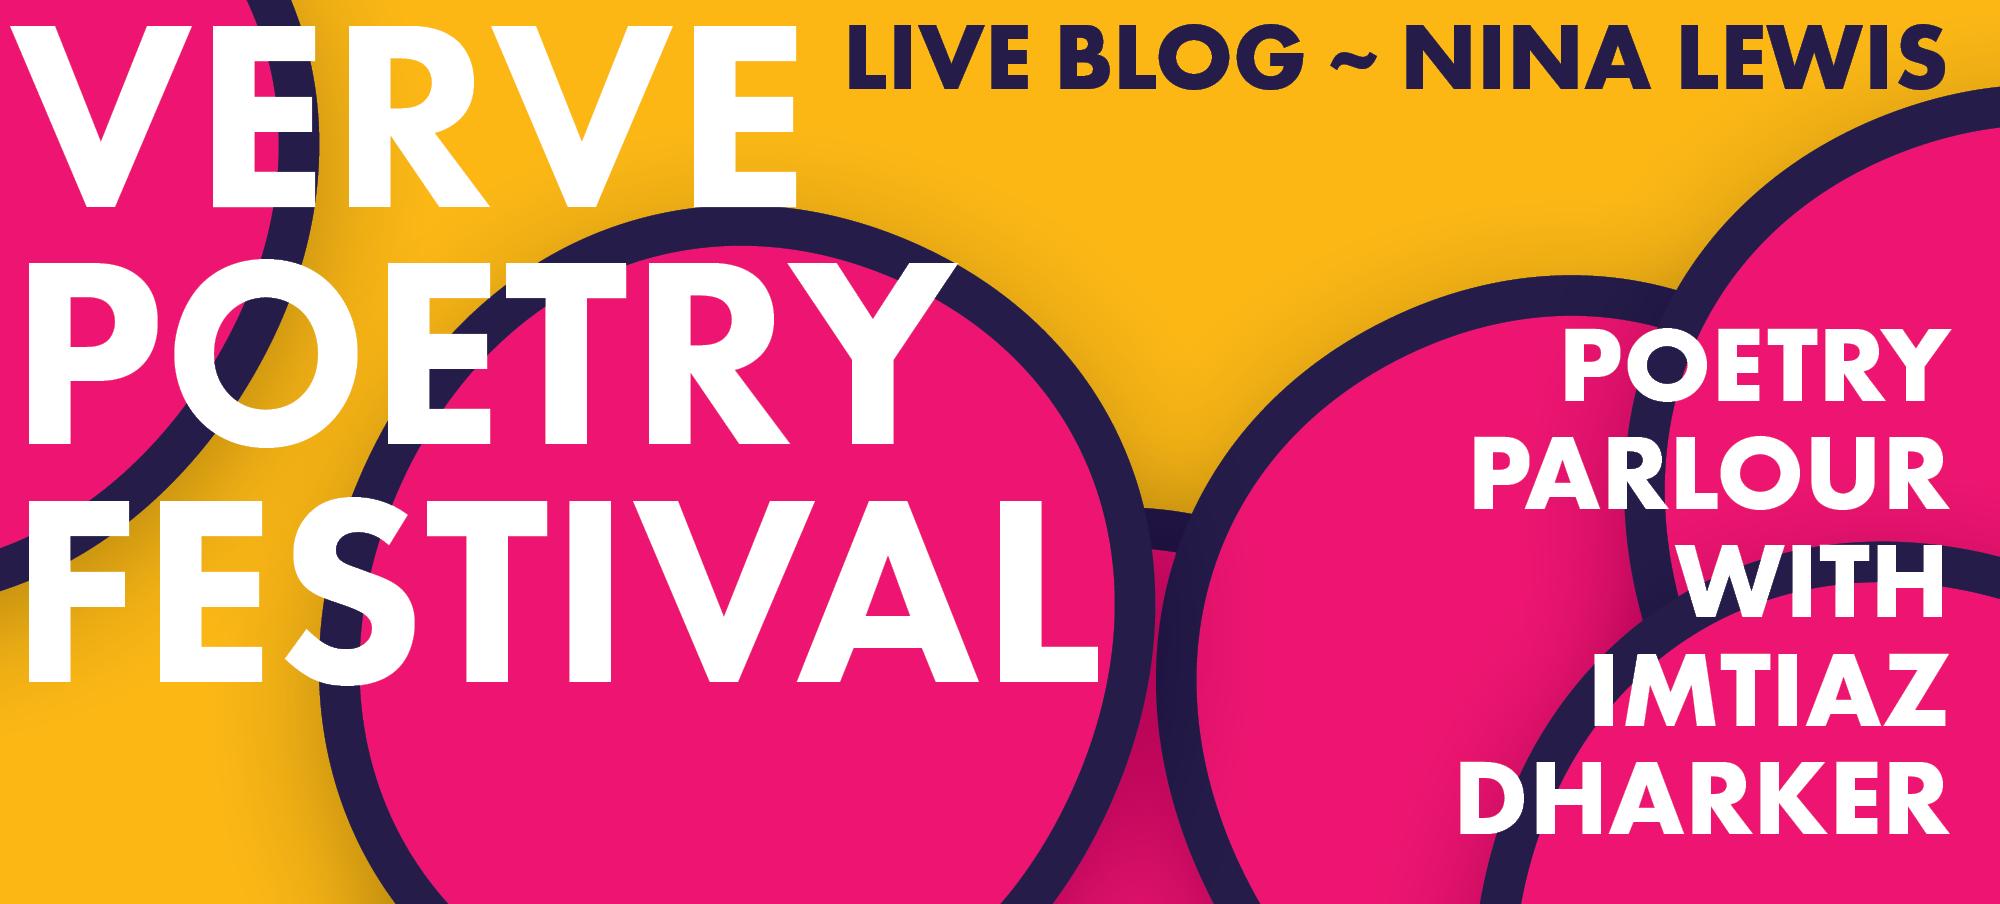 http://vervepoetryfestival.com/poetry-parlour-with-imtiaz-dharker-live-blog-nina-lewis/